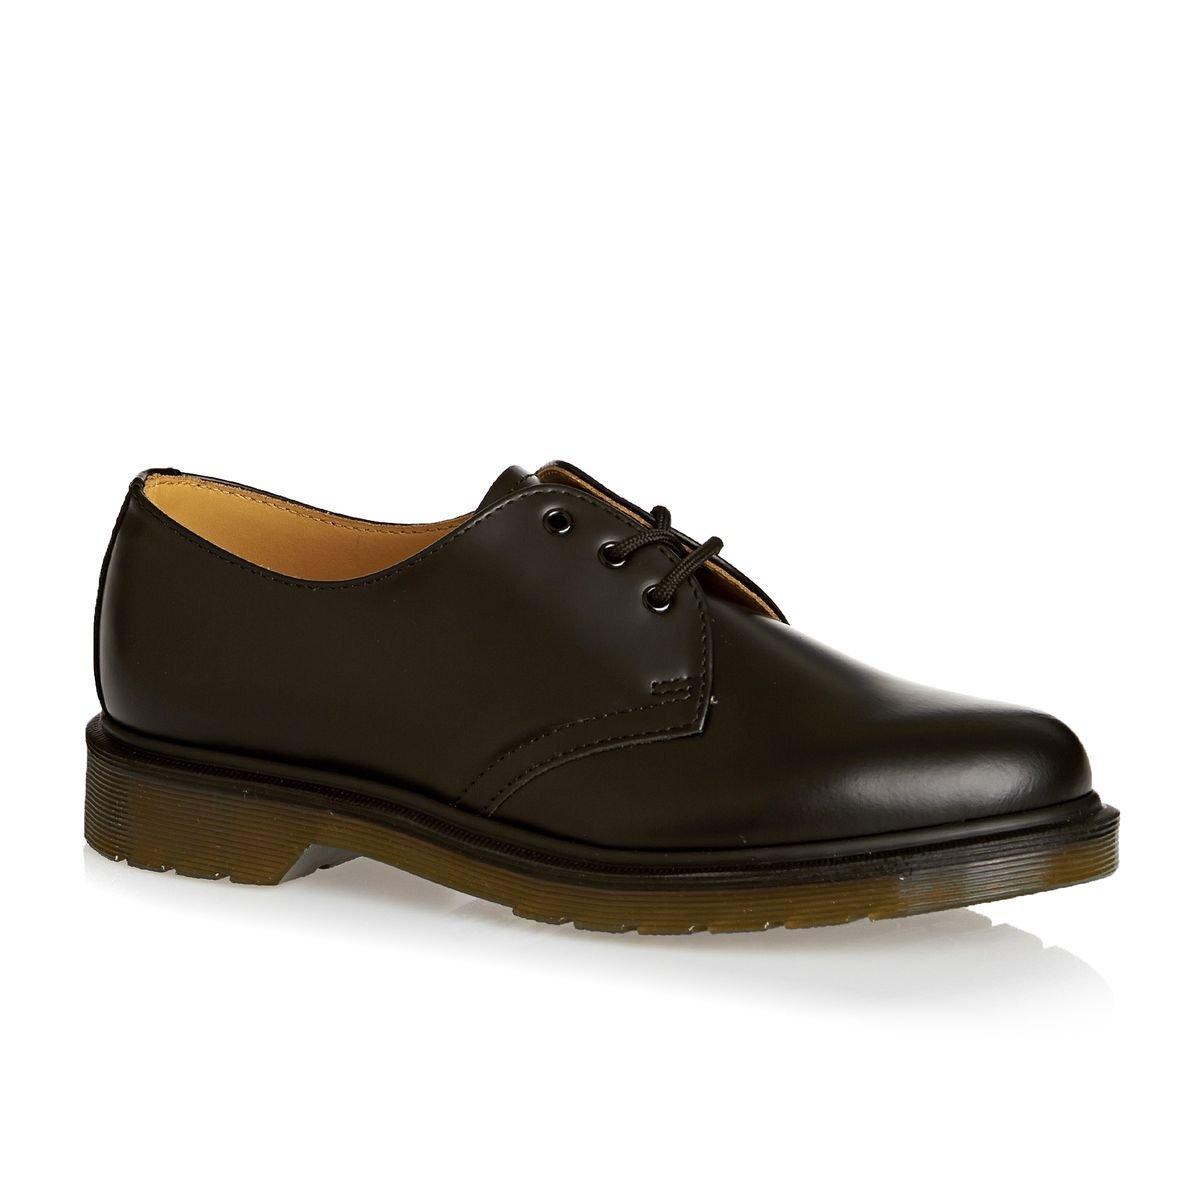 TALLA 40 EU. Dr. Martens 1461 Crazy Horse, Zapatos de Cordones Unisex Adulto